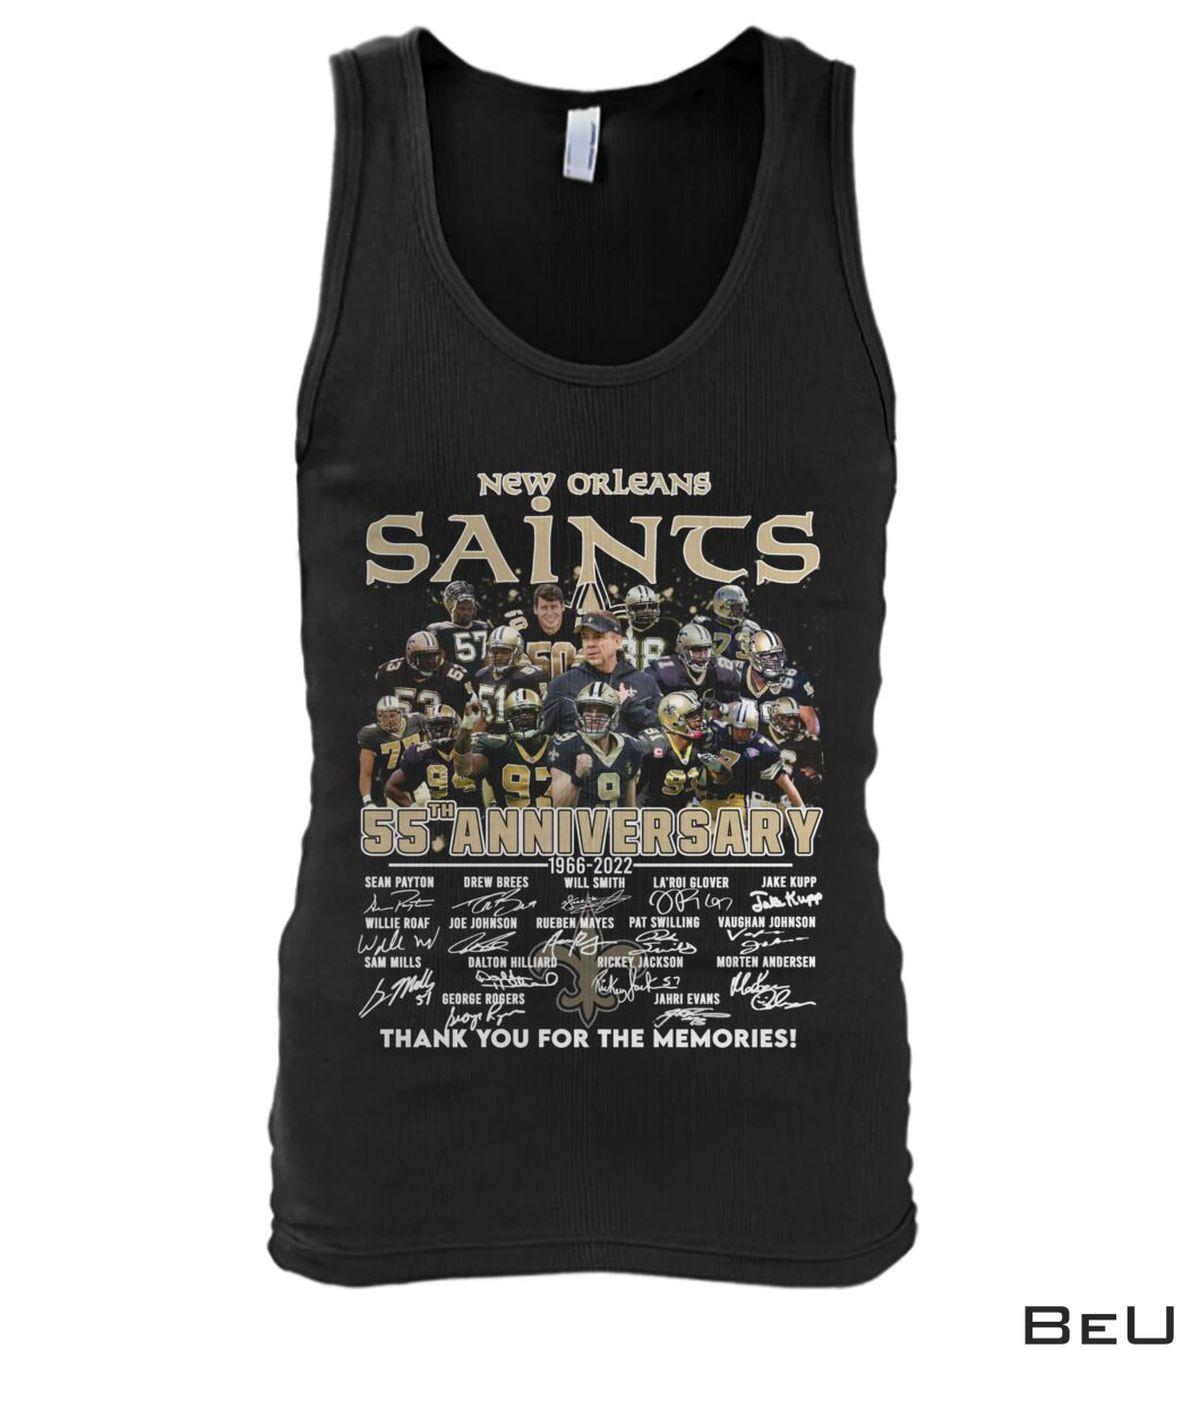 New Orleans Saints 55th Anniversary Shirt b